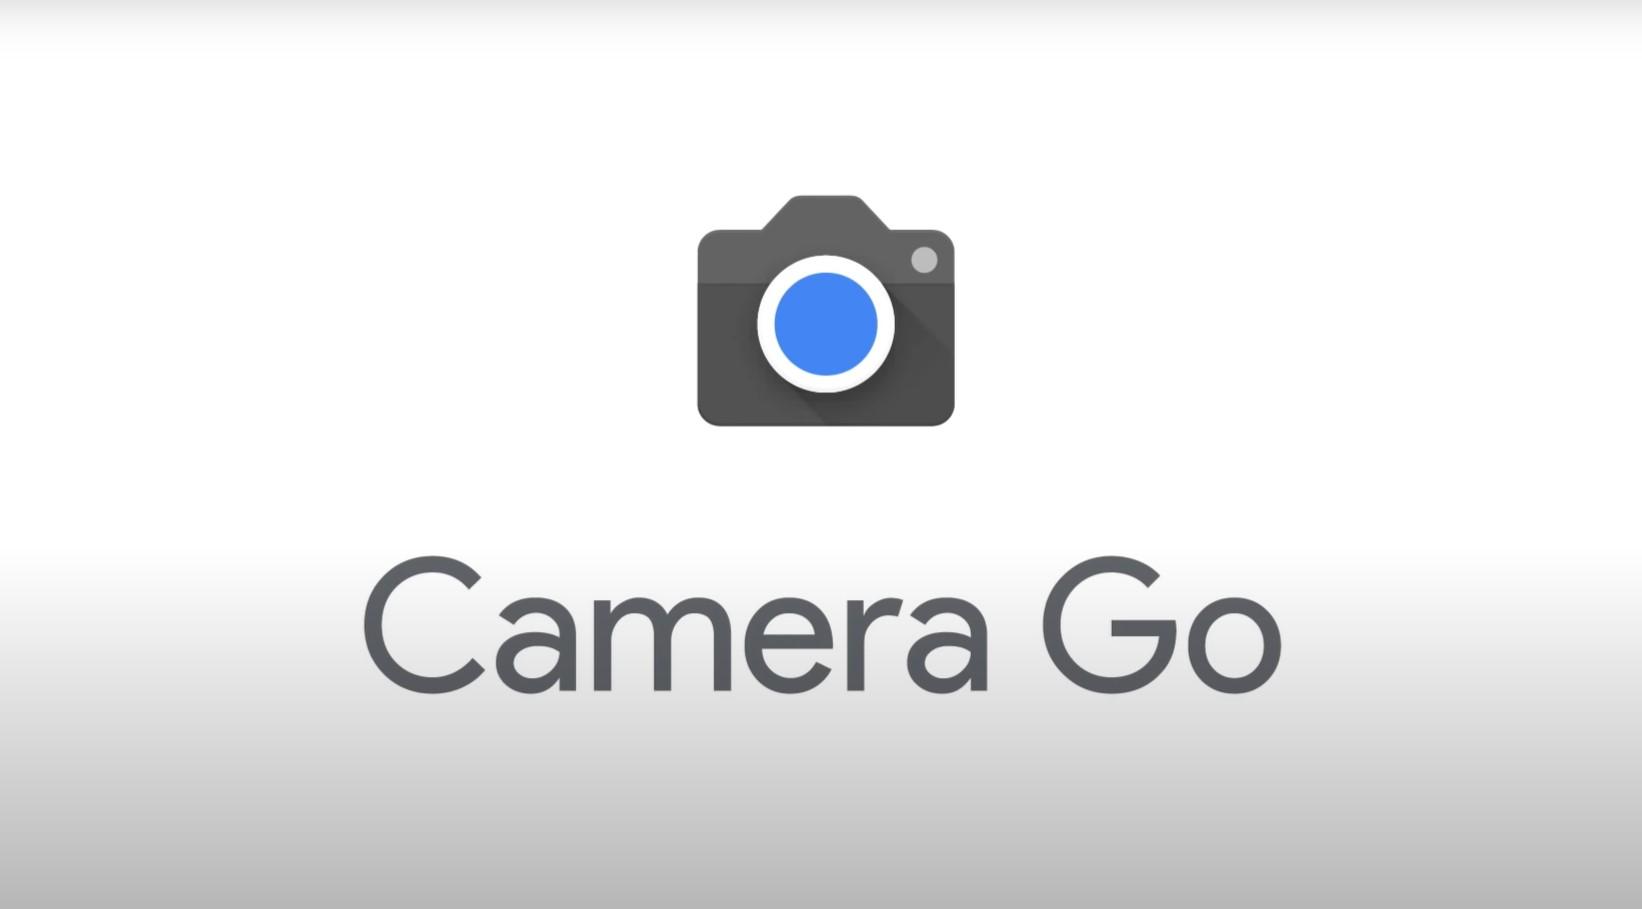 Download Google Camera Go 2.5 APK With Secondary Camera Support, Night Mode, HDR+ | GCAM GO 2.5